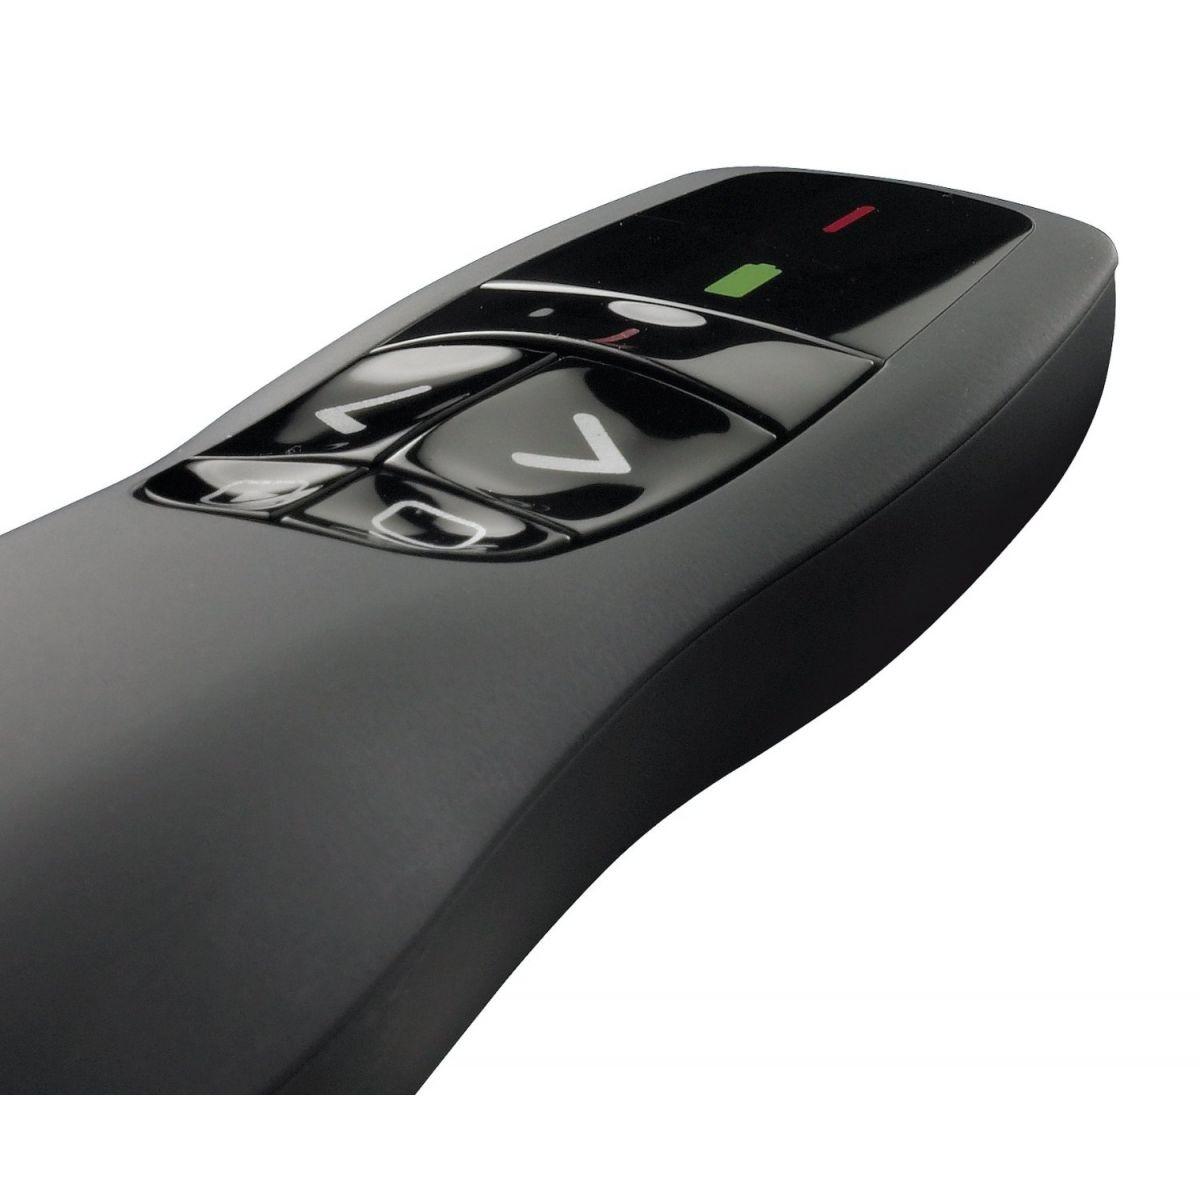 Apresentador Logitech Wireless Presenter R400 - 910-001354 / 910-001477